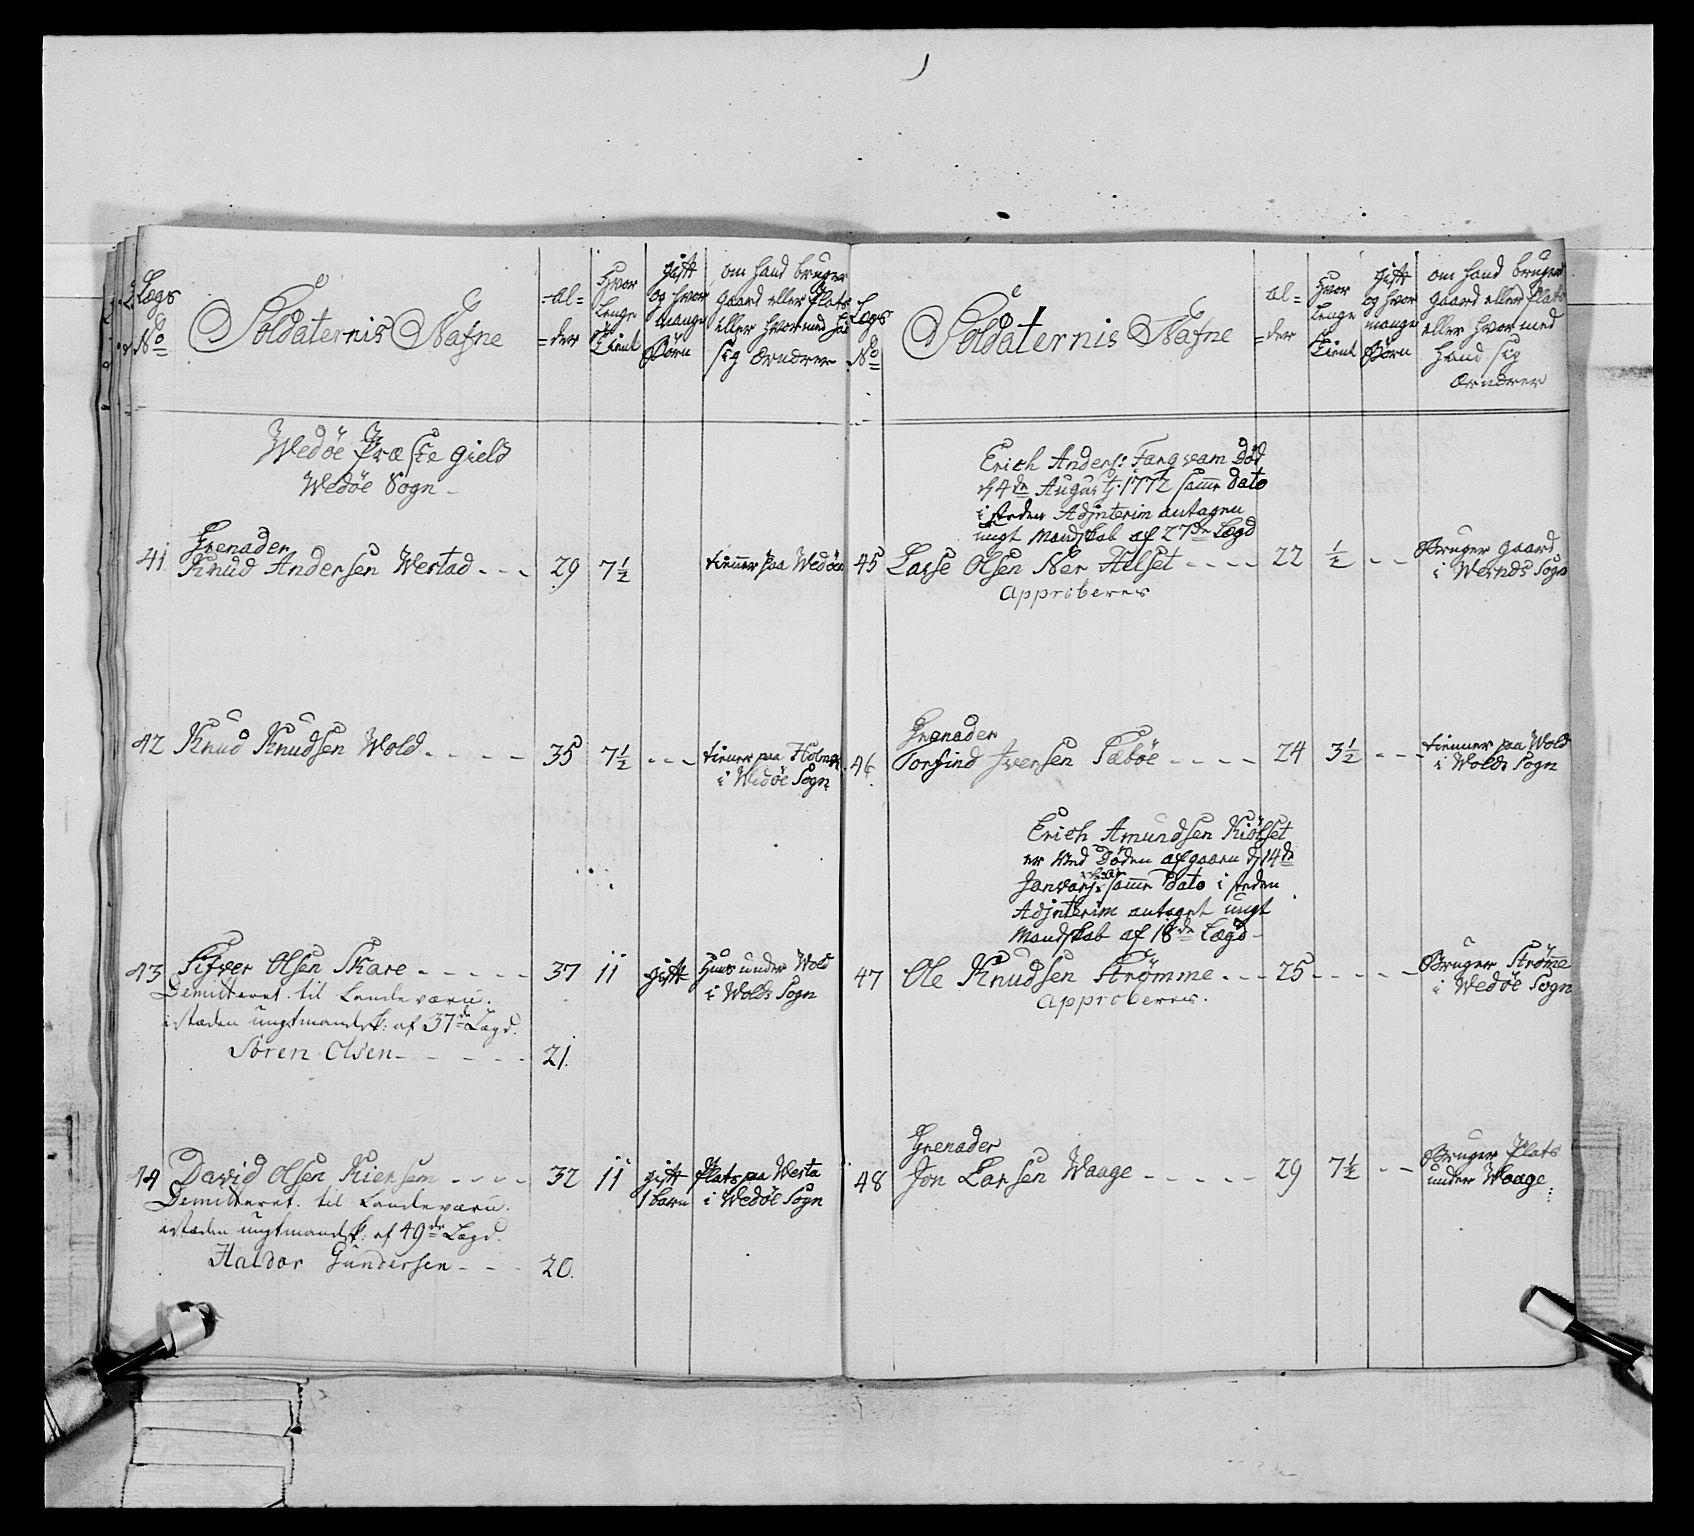 RA, Generalitets- og kommissariatskollegiet, Det kongelige norske kommissariatskollegium, E/Eh/L0076: 2. Trondheimske nasjonale infanteriregiment, 1766-1773, p. 516